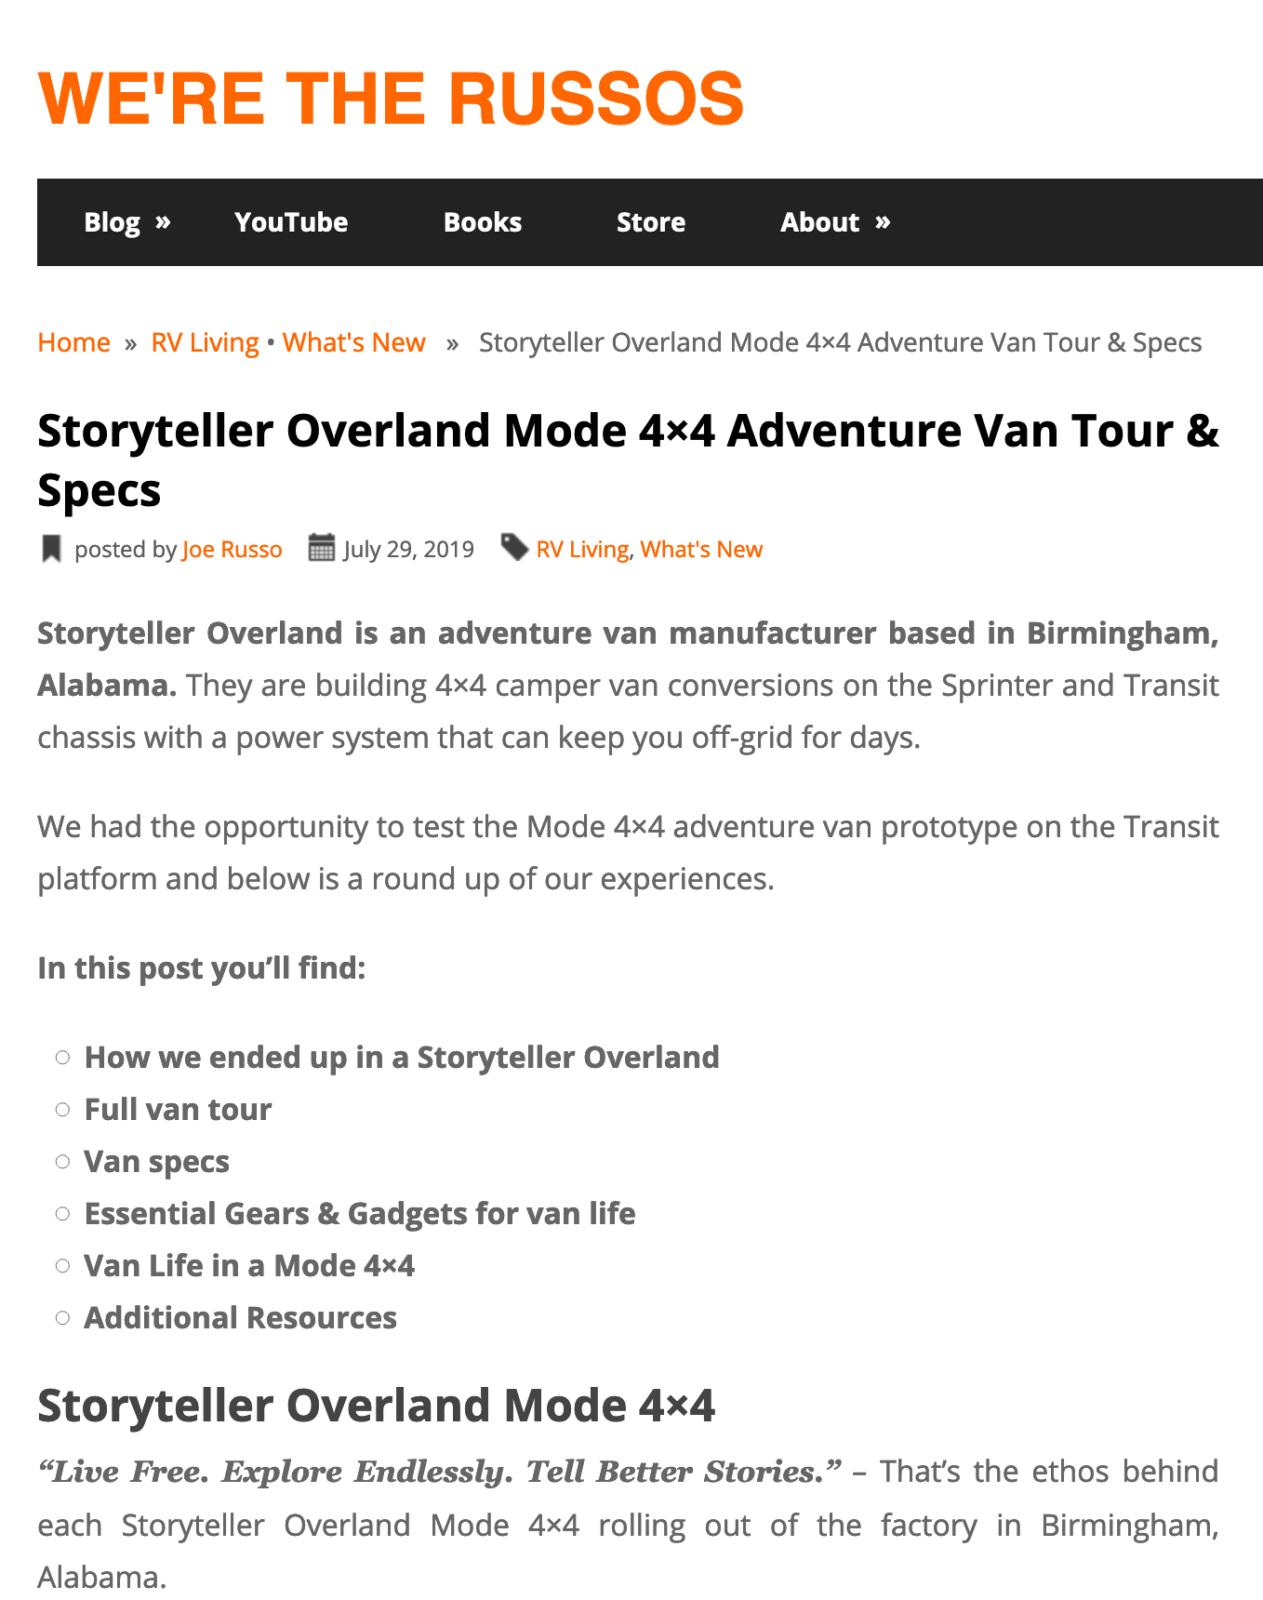 Storyteller Overland We're the Russos